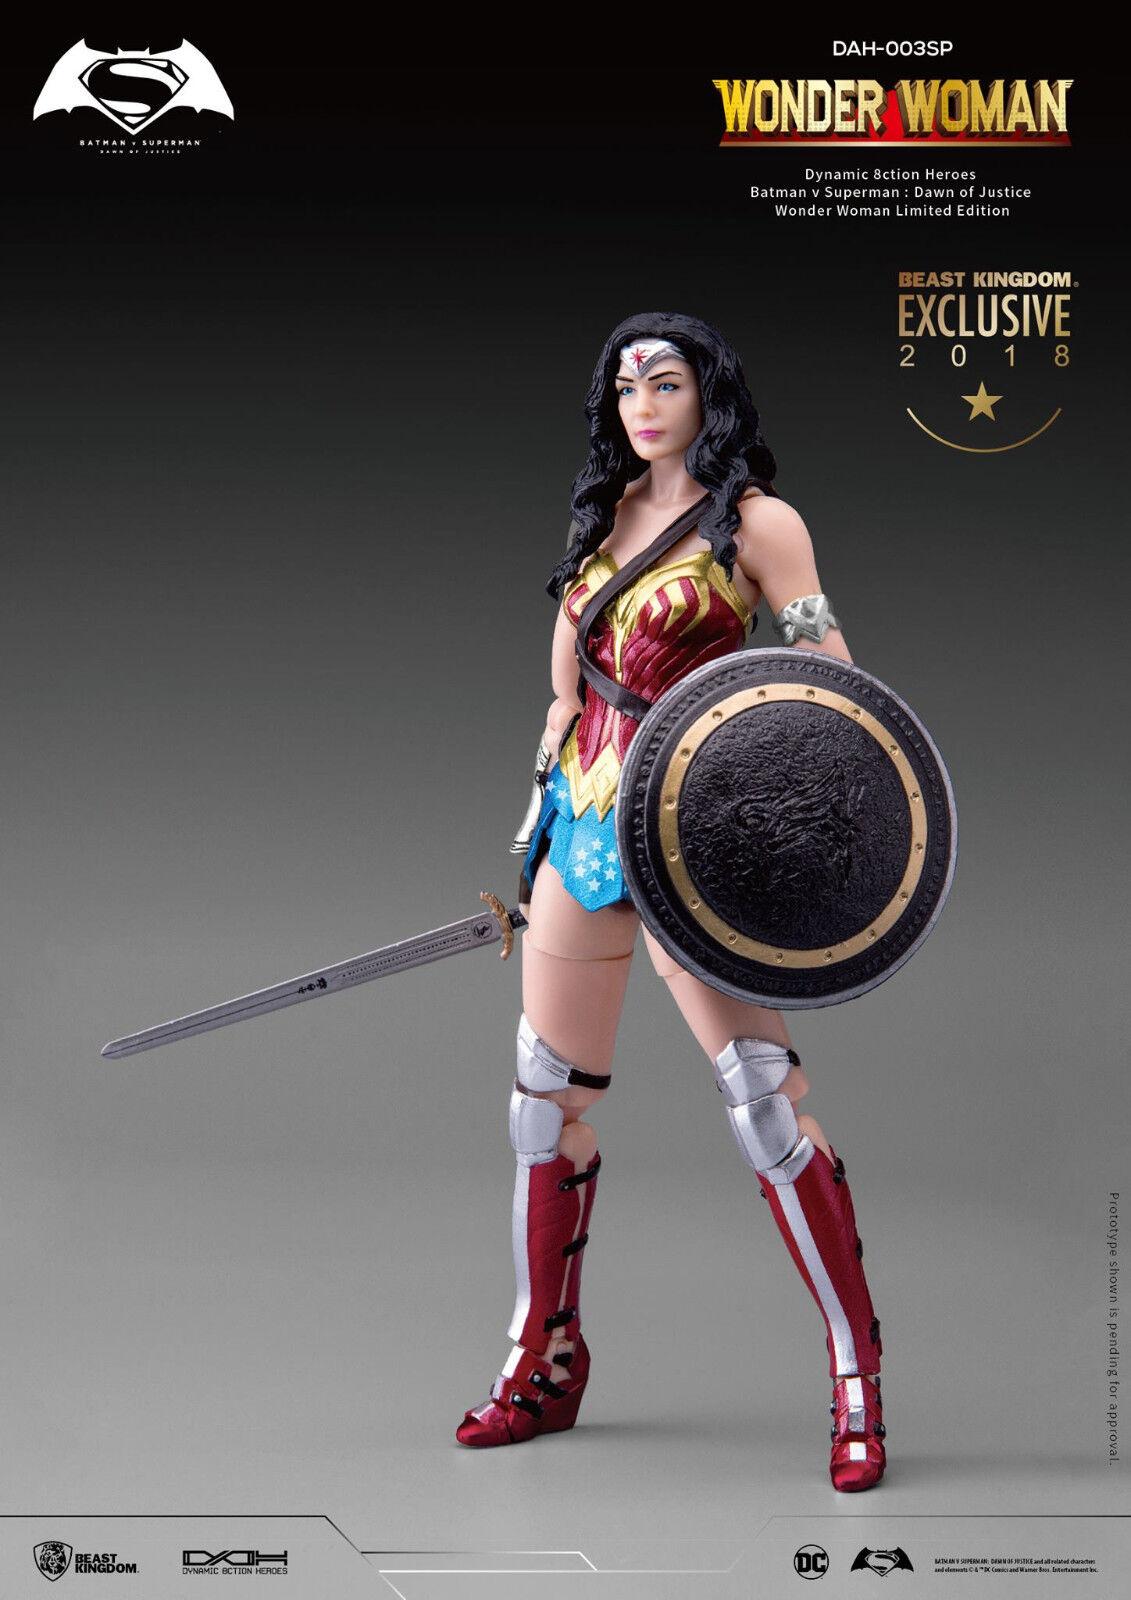 San Diego comic-con 2018 Beast Kingdom DC Wonder Woman BVS Dawn of Justice Action Figure